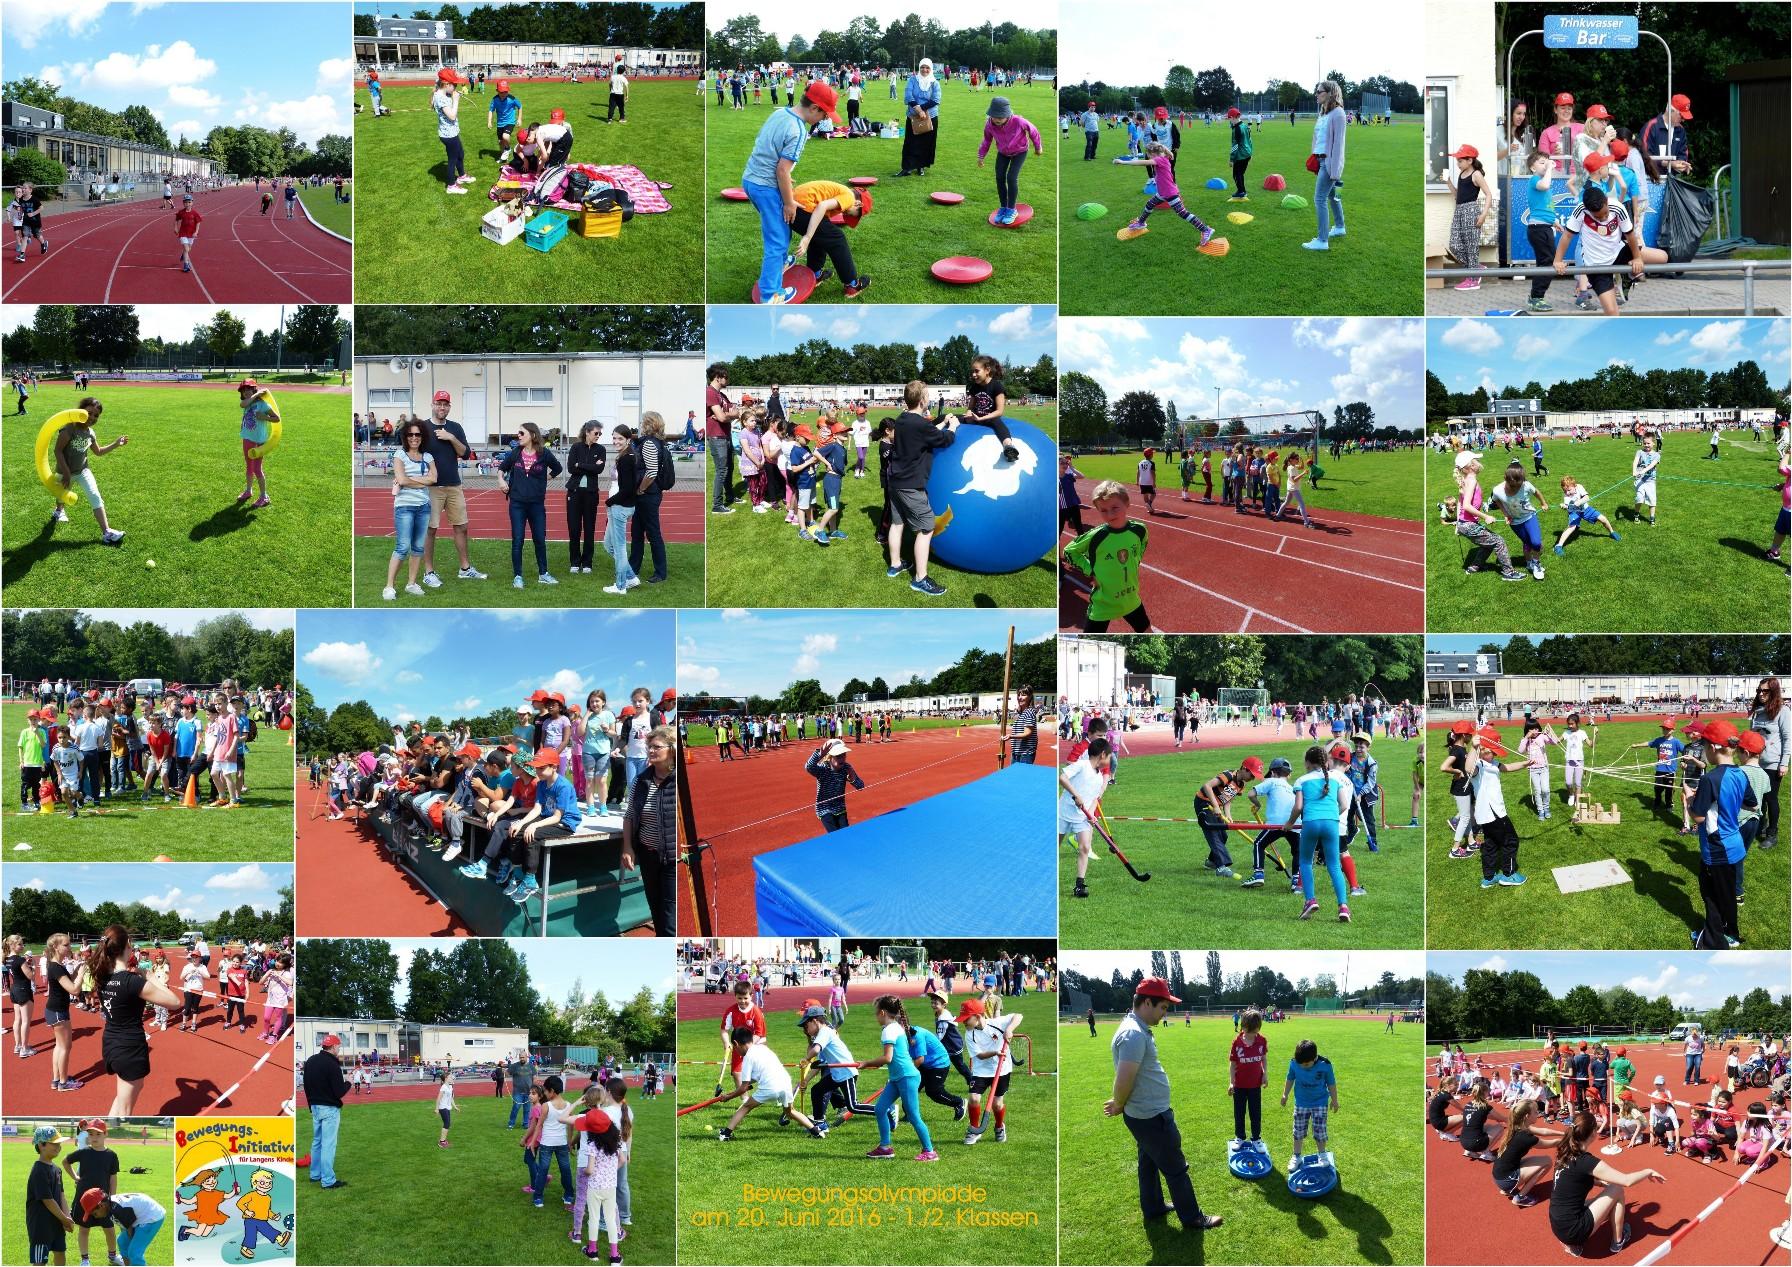 2016-06-20_Bewegungsoly.jpg